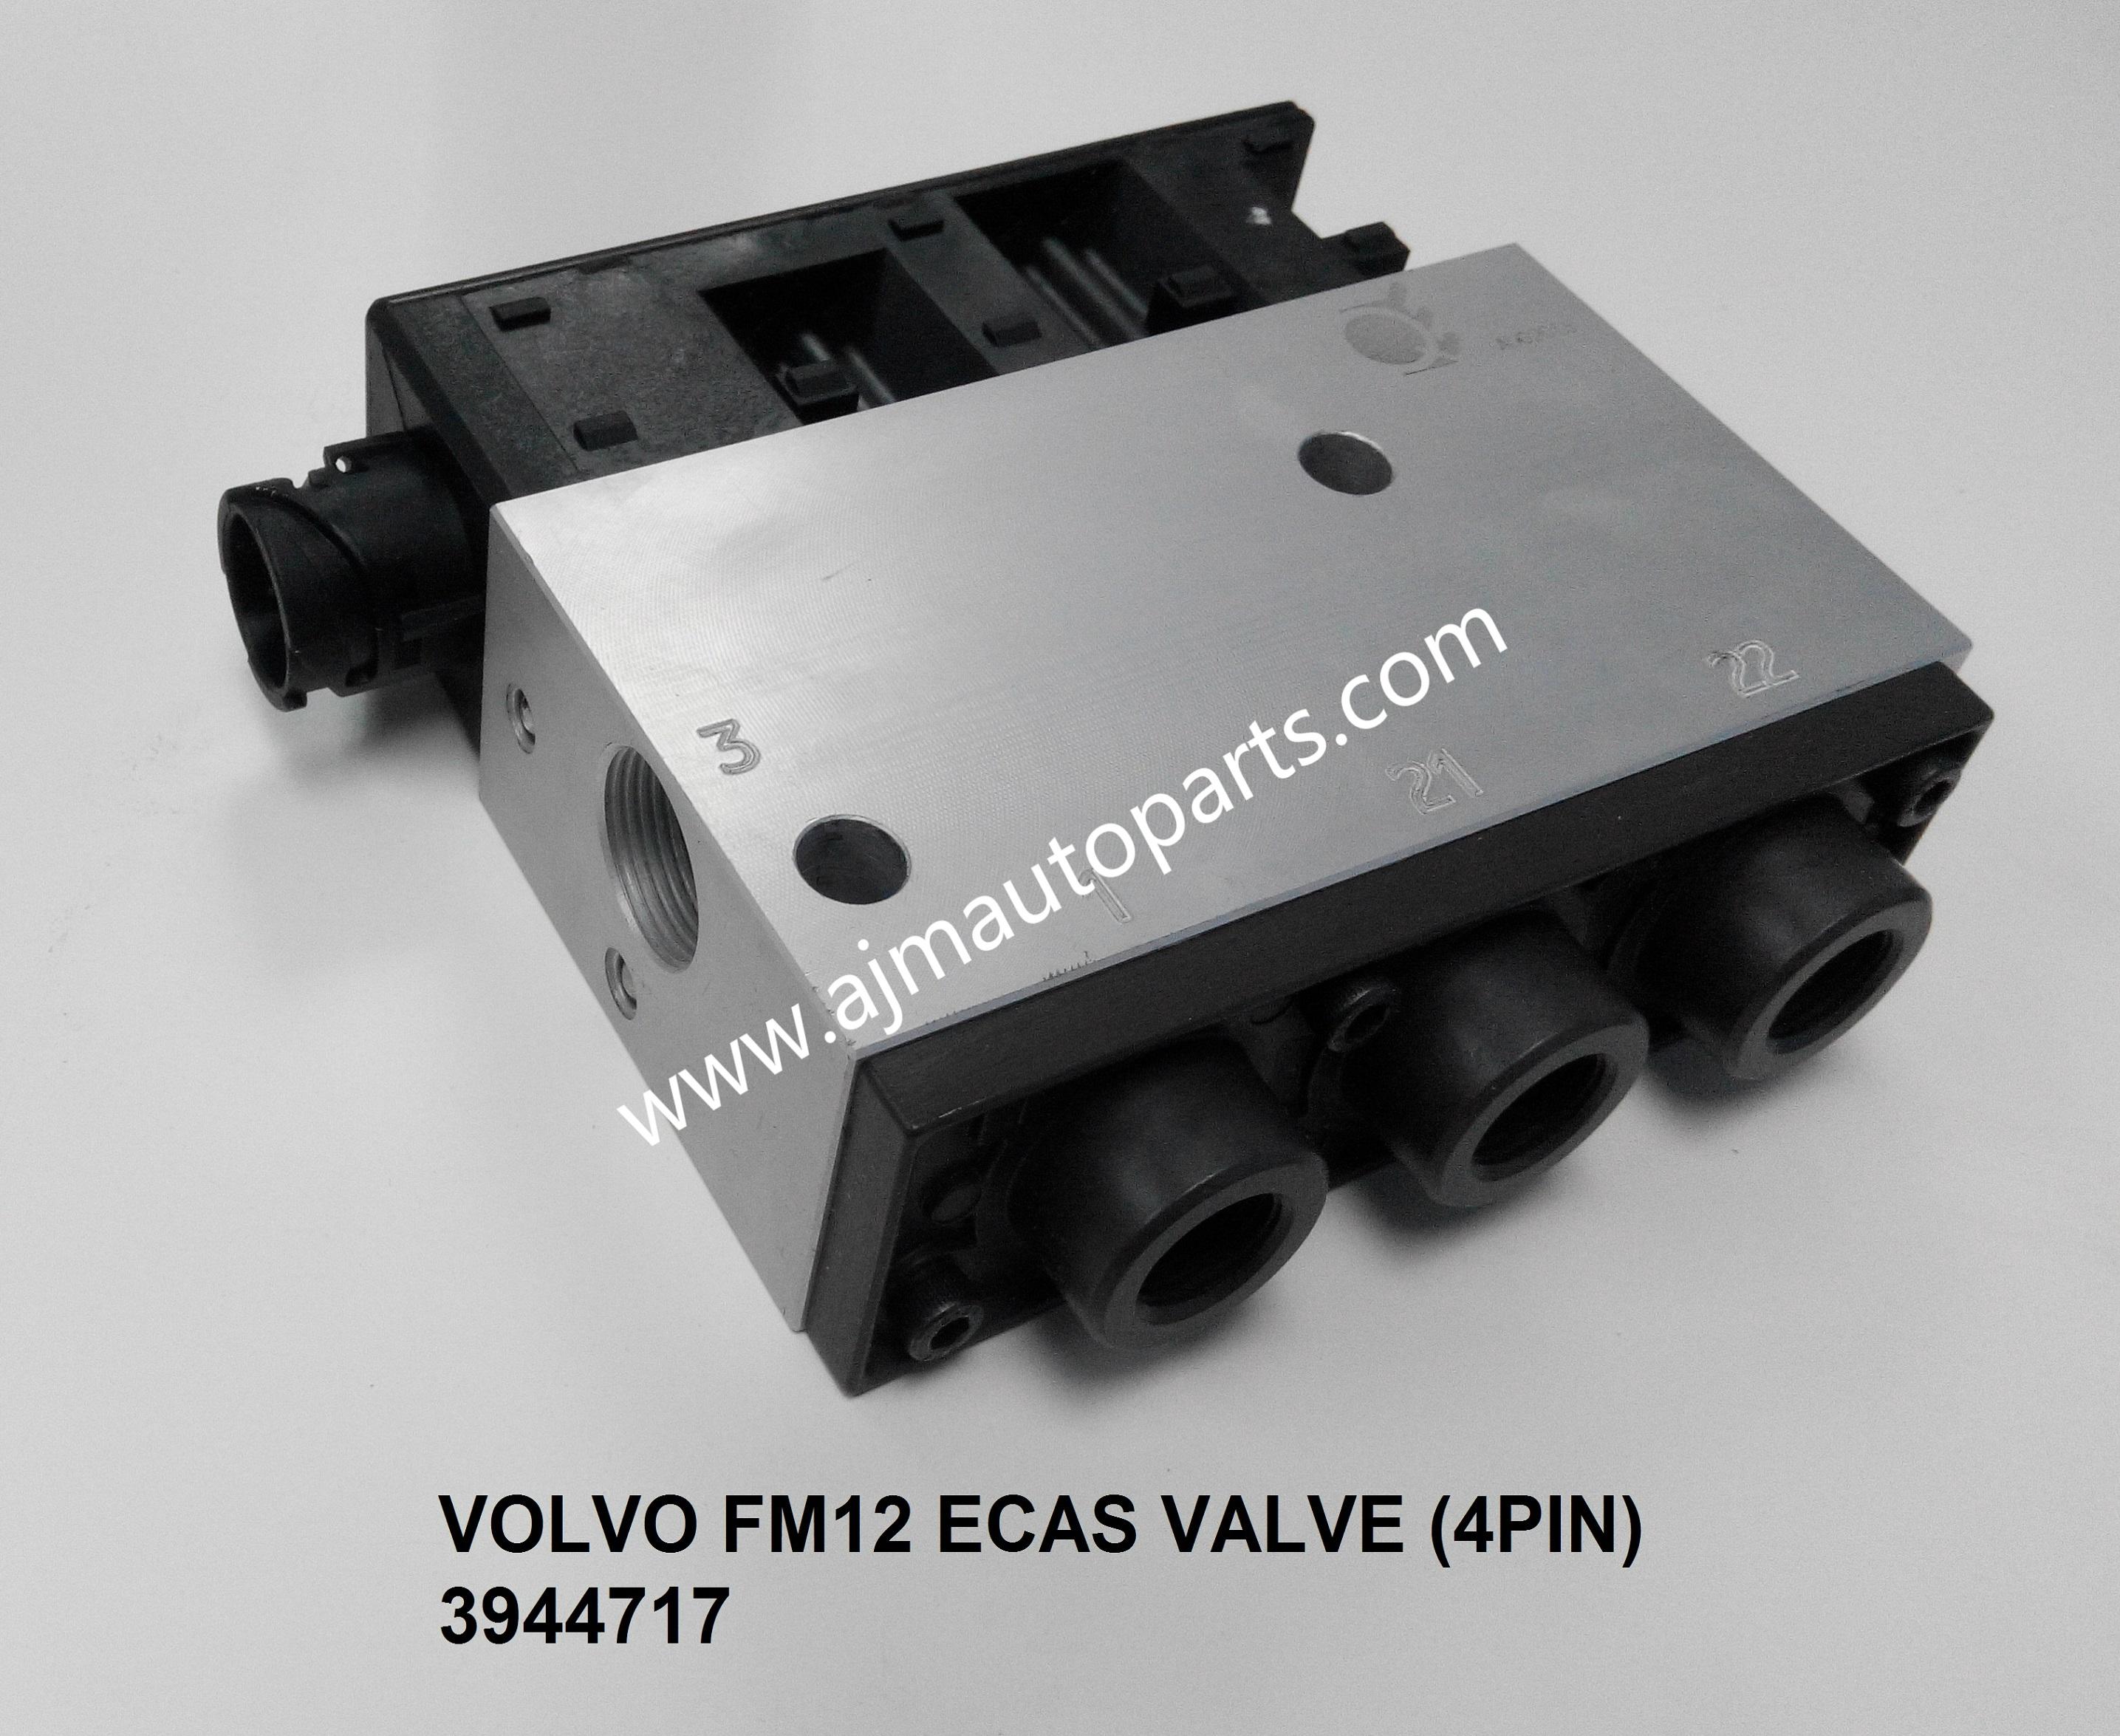 VOLVO_FM12_ECAS_VALVE(4PIN)-3944717